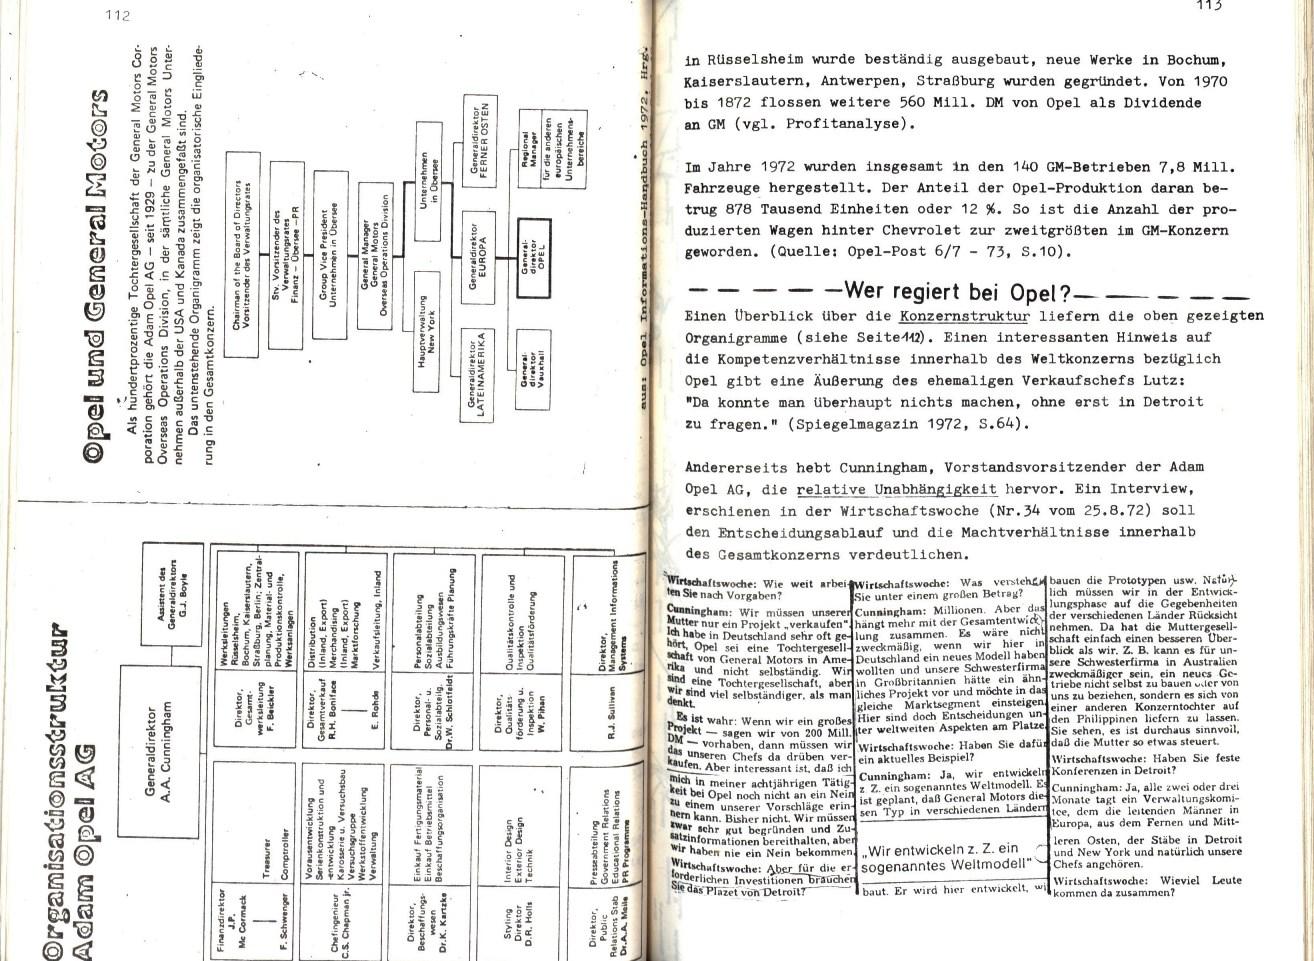 Bochum_IGM_Opel_PG_Opel_streikt_1973_058